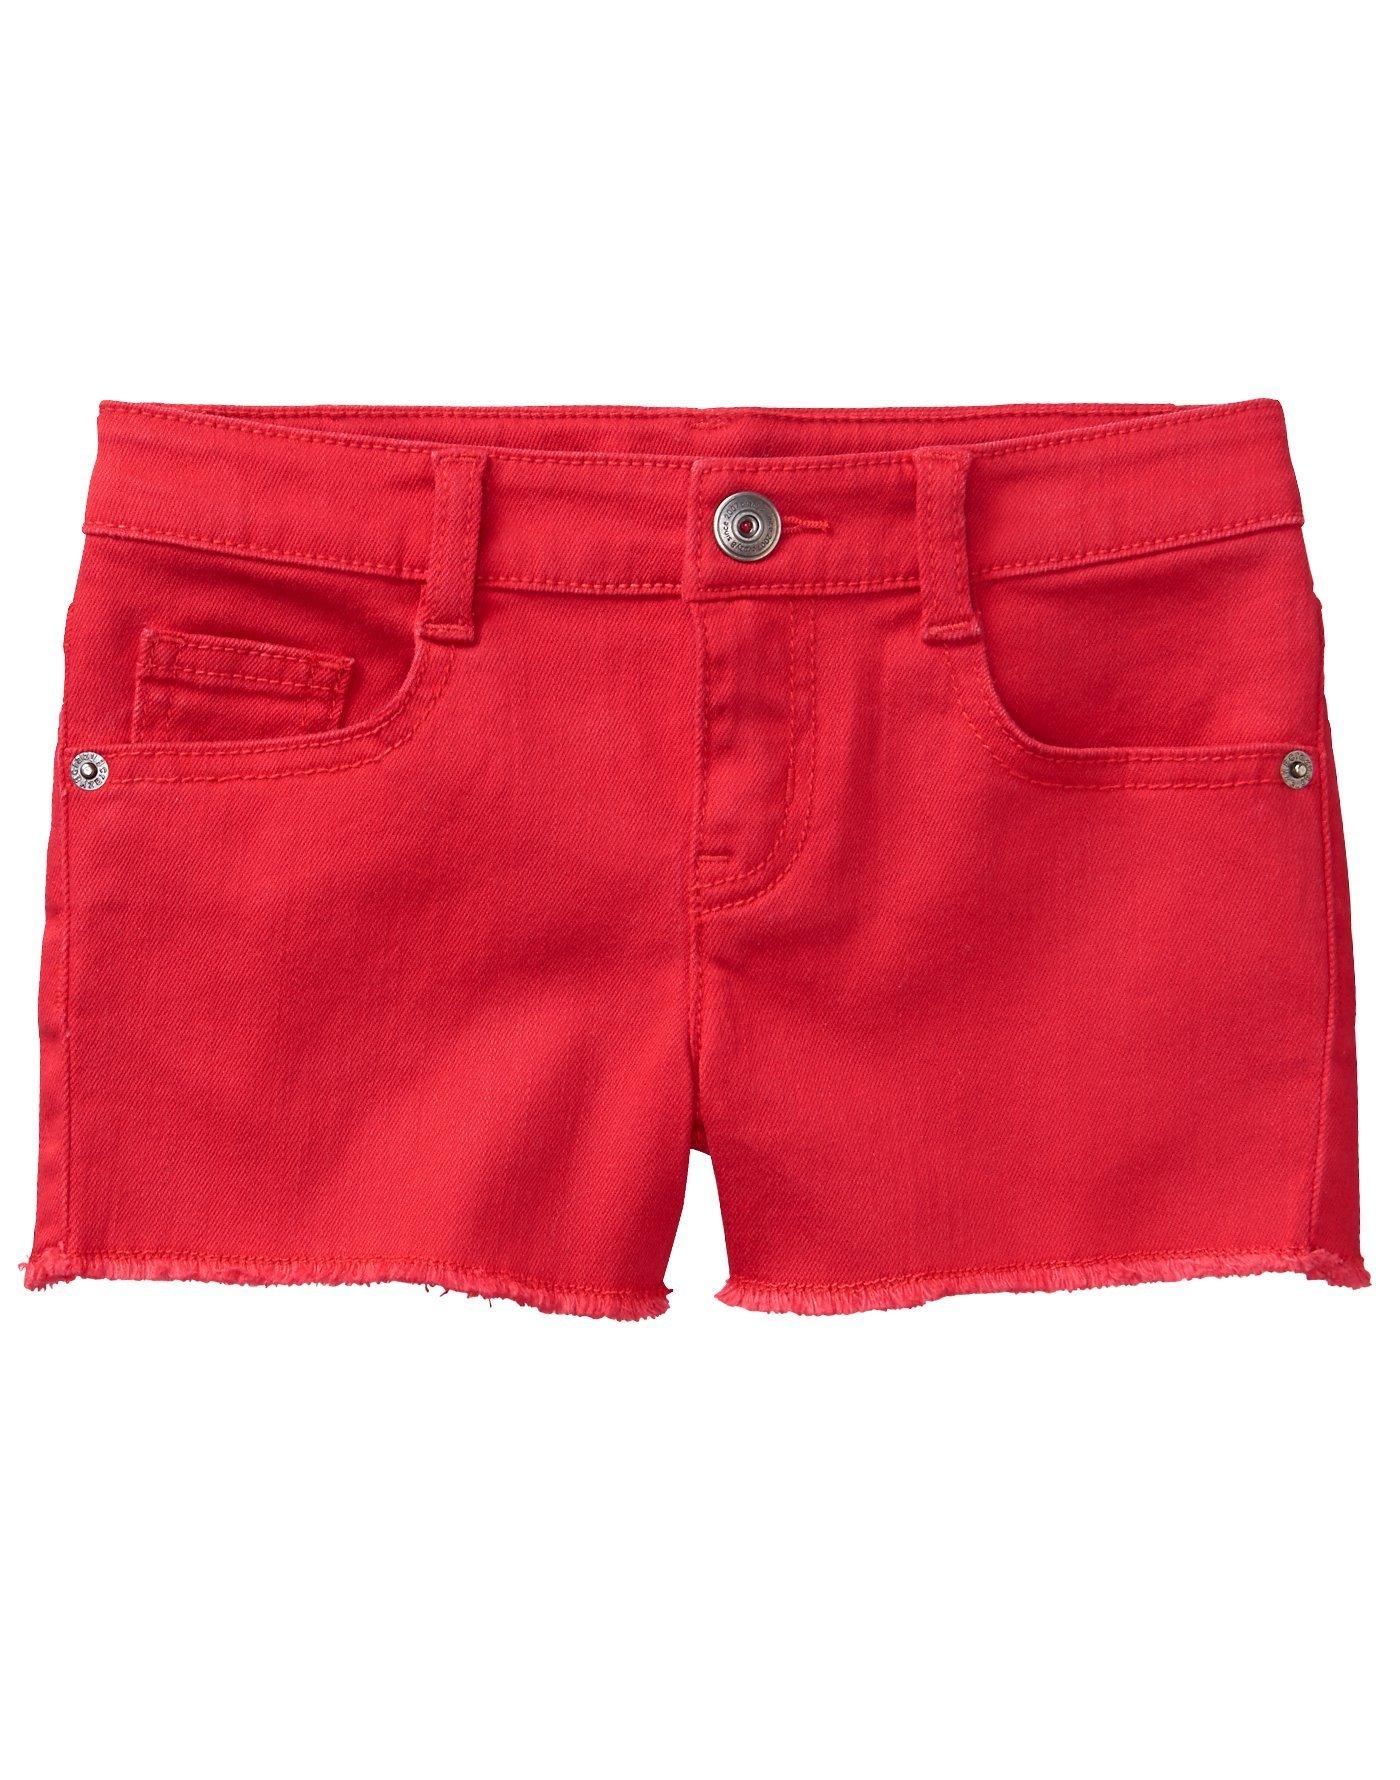 Crazy 8 Little Girls' 5-Pocket Raw Hem Denim Short, Red, 8